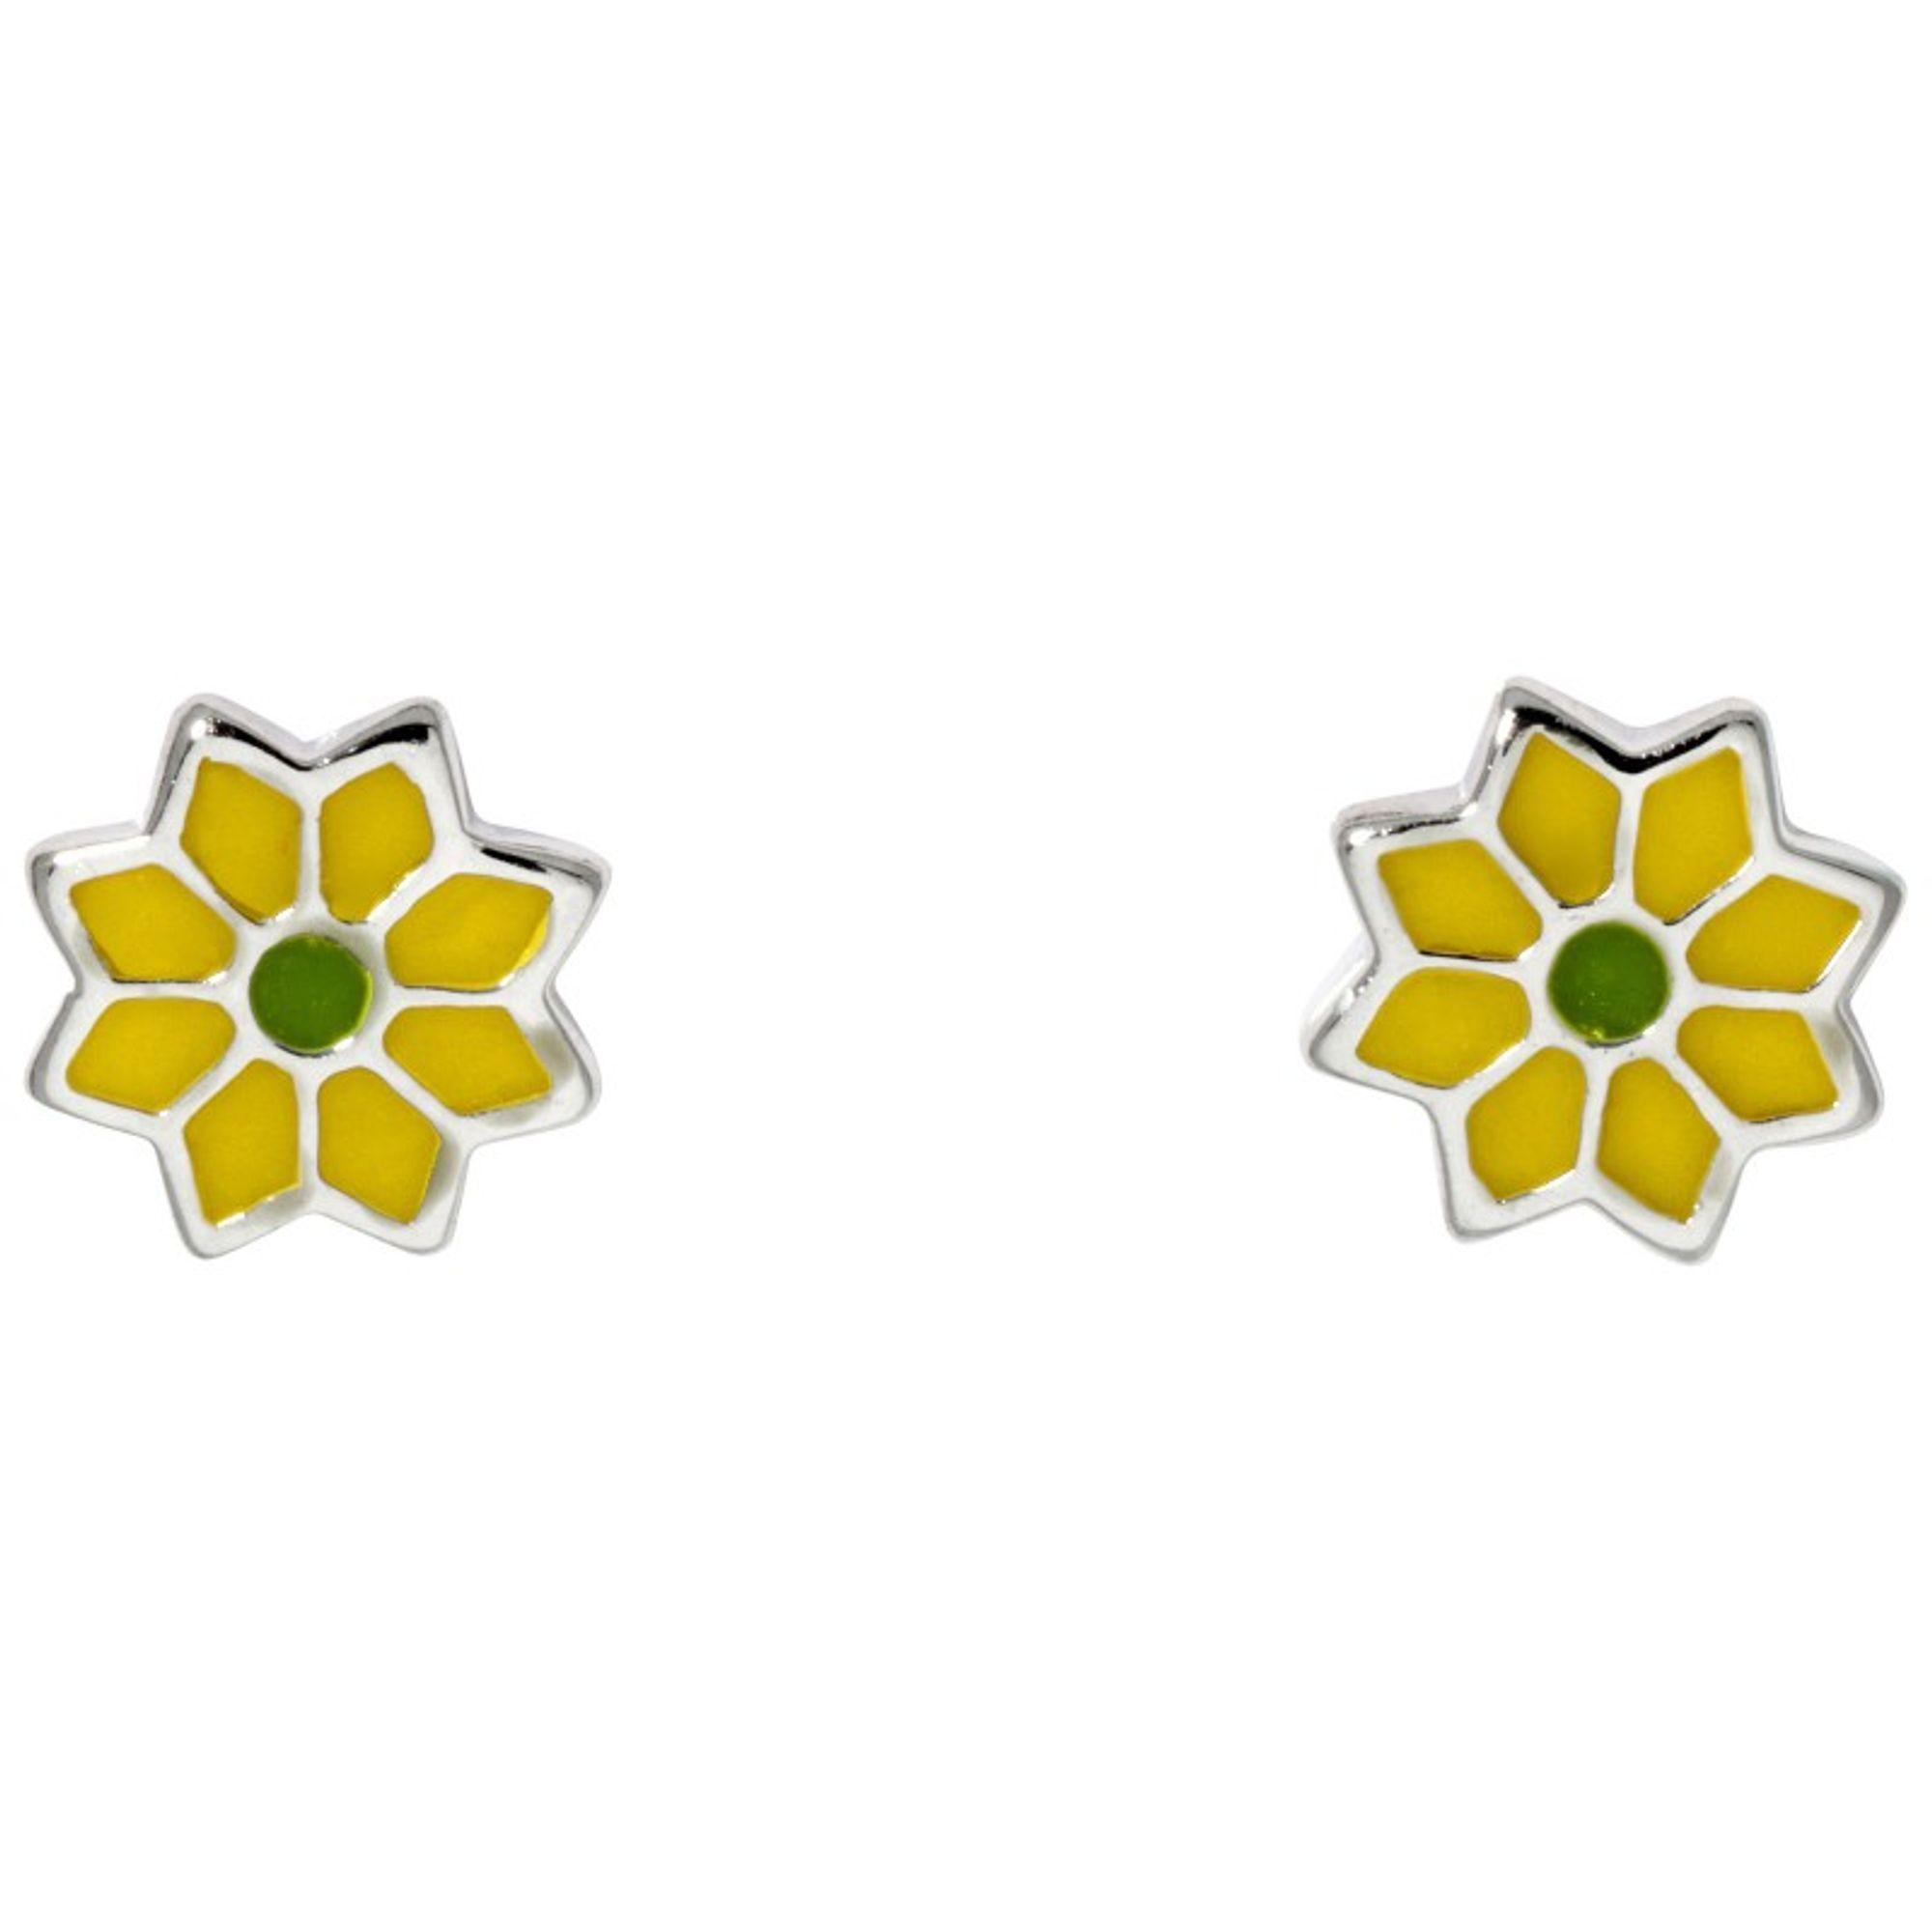 Basic Silber SK23 Kinder Ohrschmuck Blume Silber grün gelb